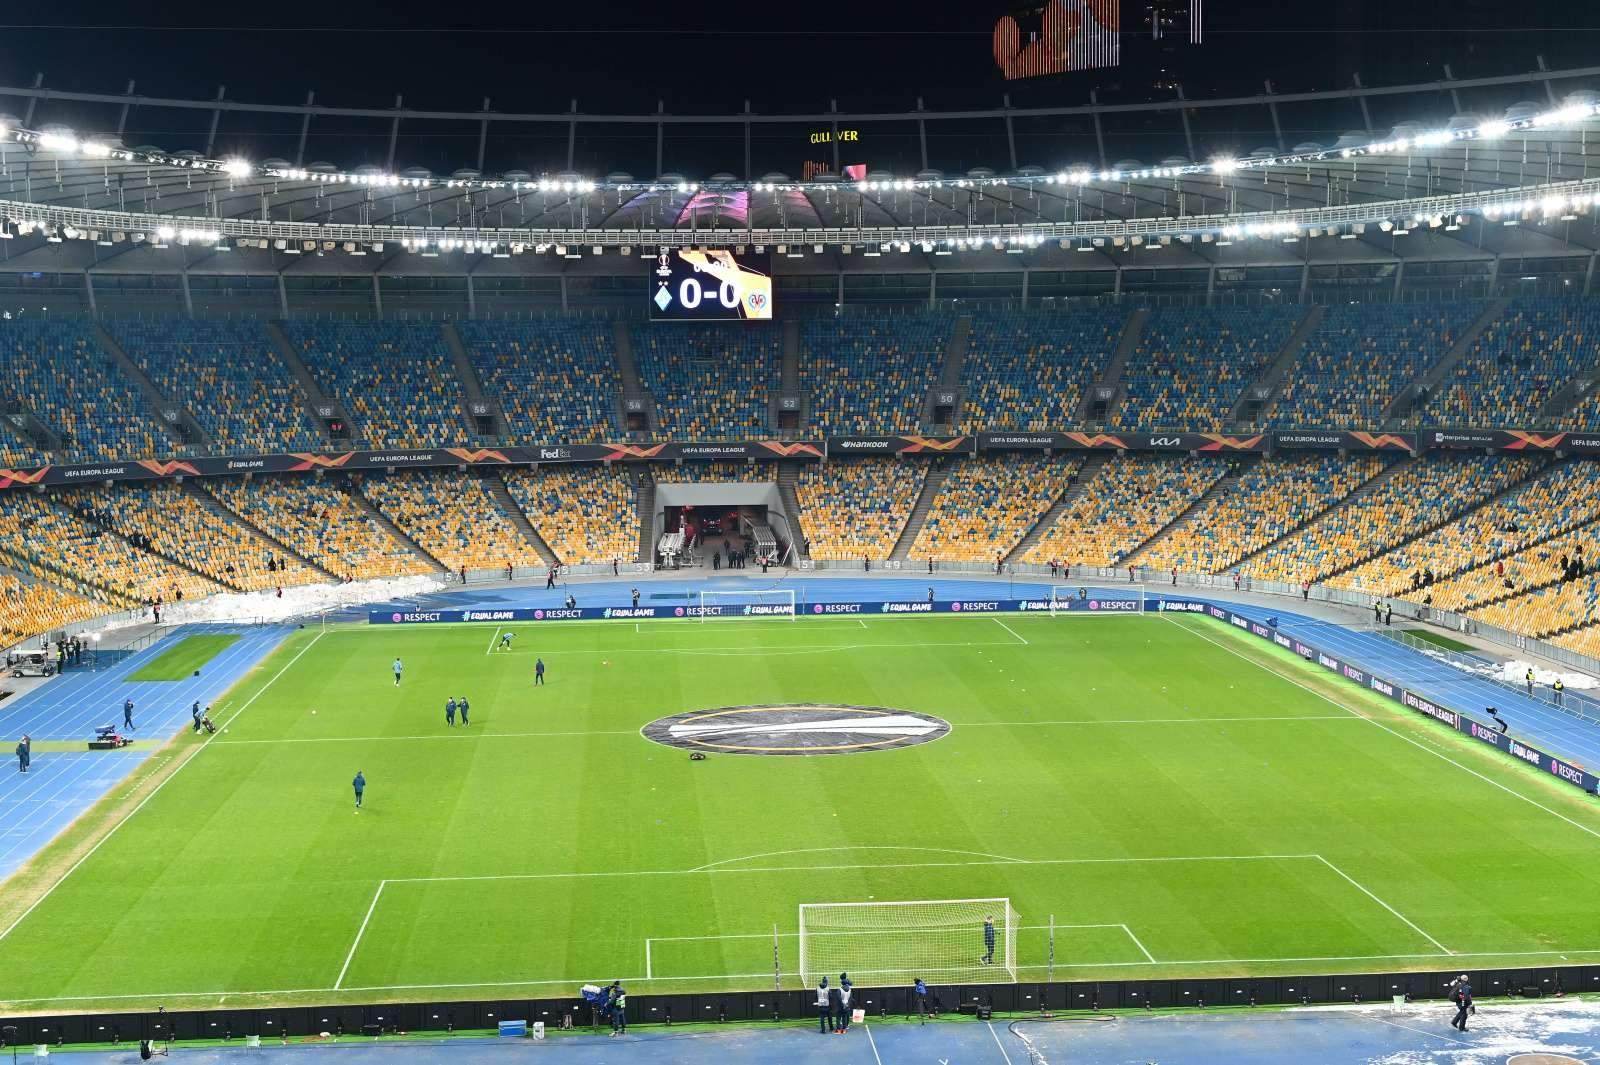 На стадионе в Киеве после украинского класико избили депутата